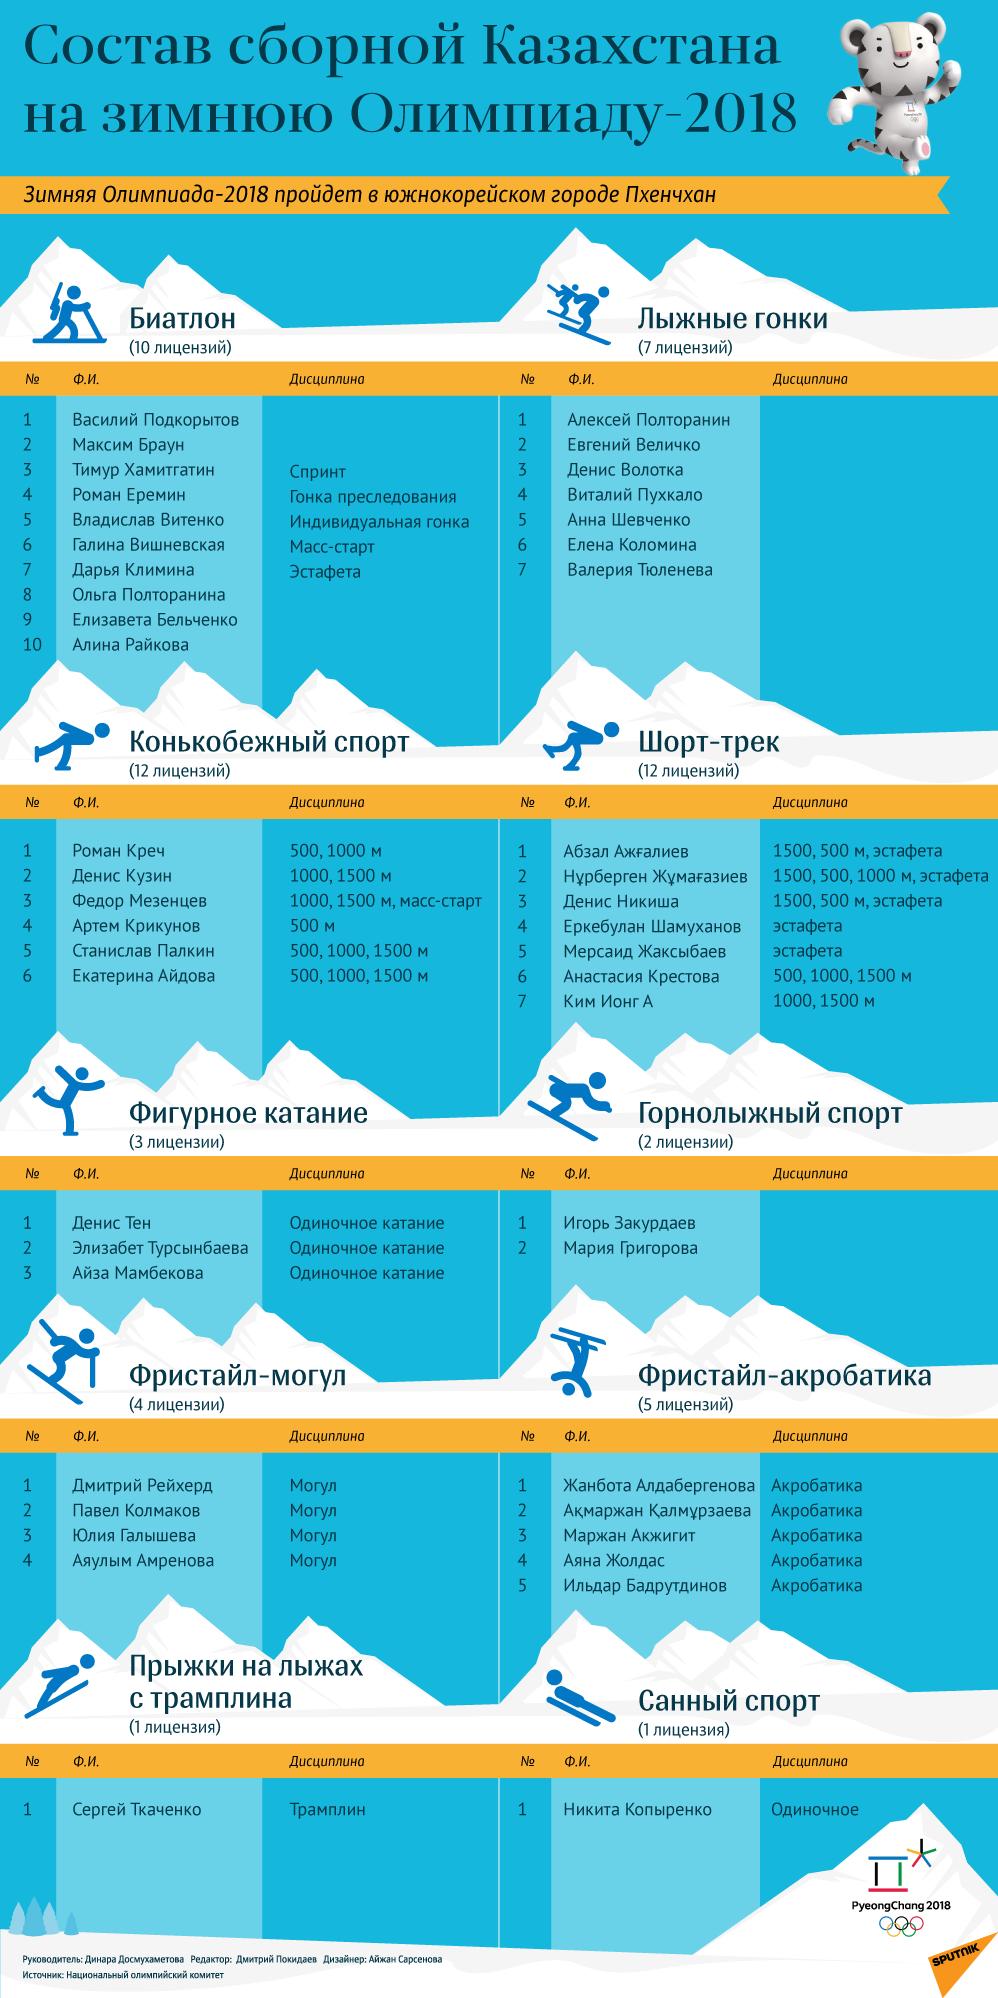 Состав сборной Казахстана на Олимпиаду-2018